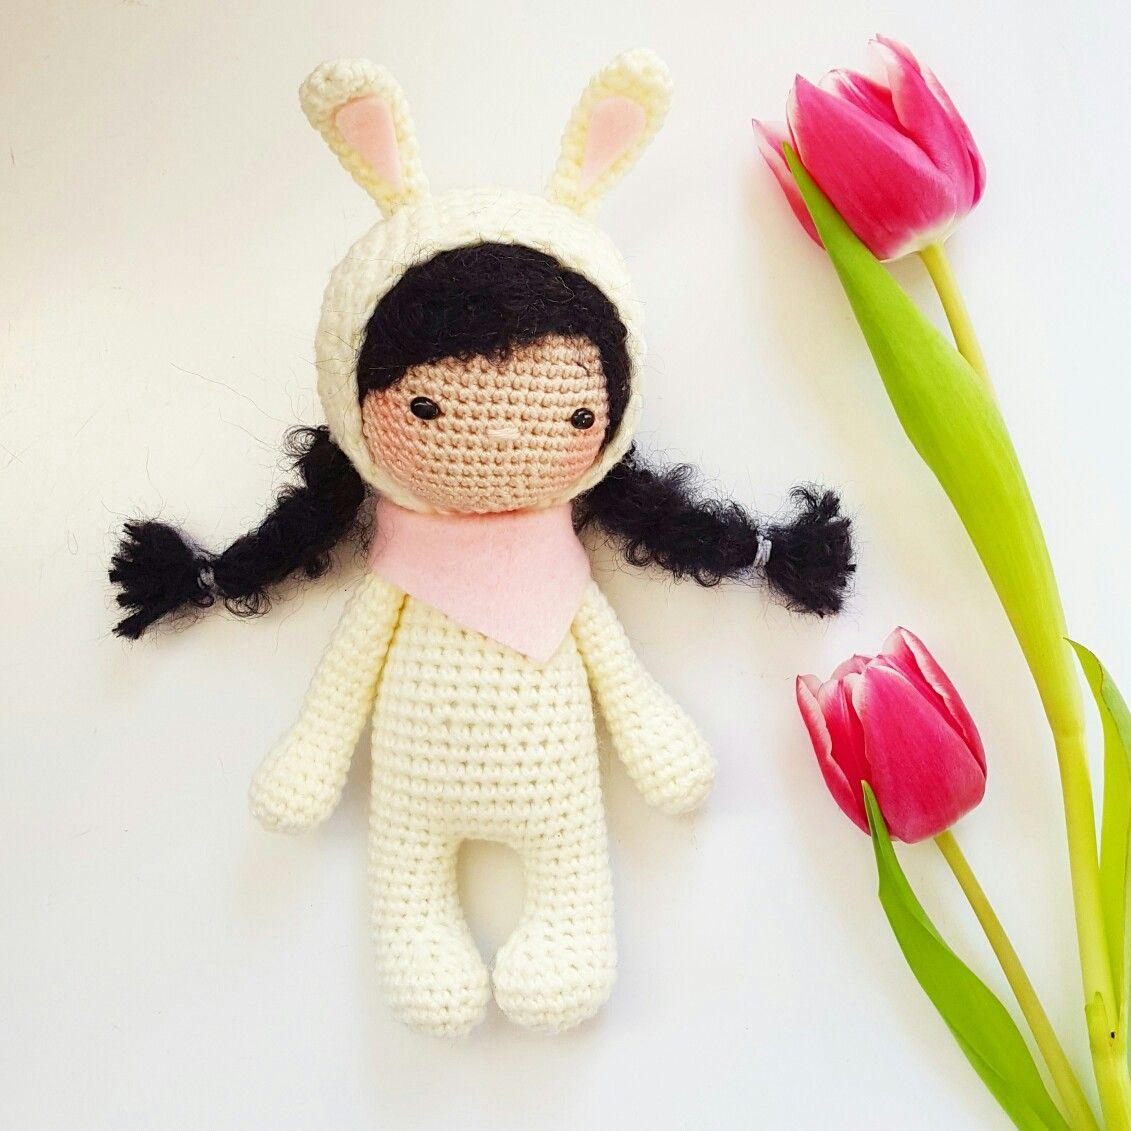 Easter bunny Pattern Amigurumi Crochet Amalou.Designs | Easter ...